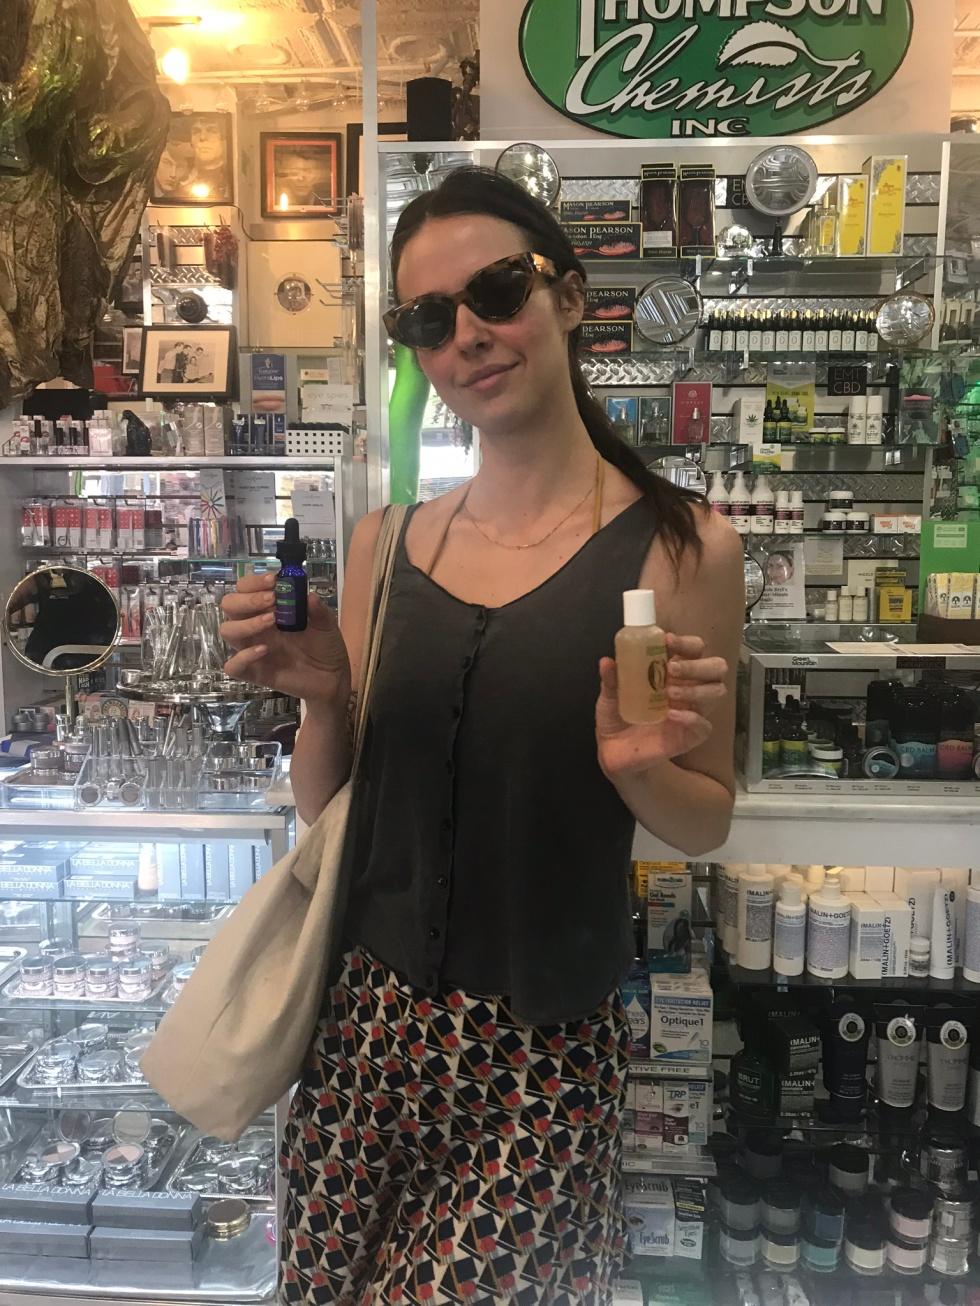 Pretty lady holding Thompson Alchemists body products